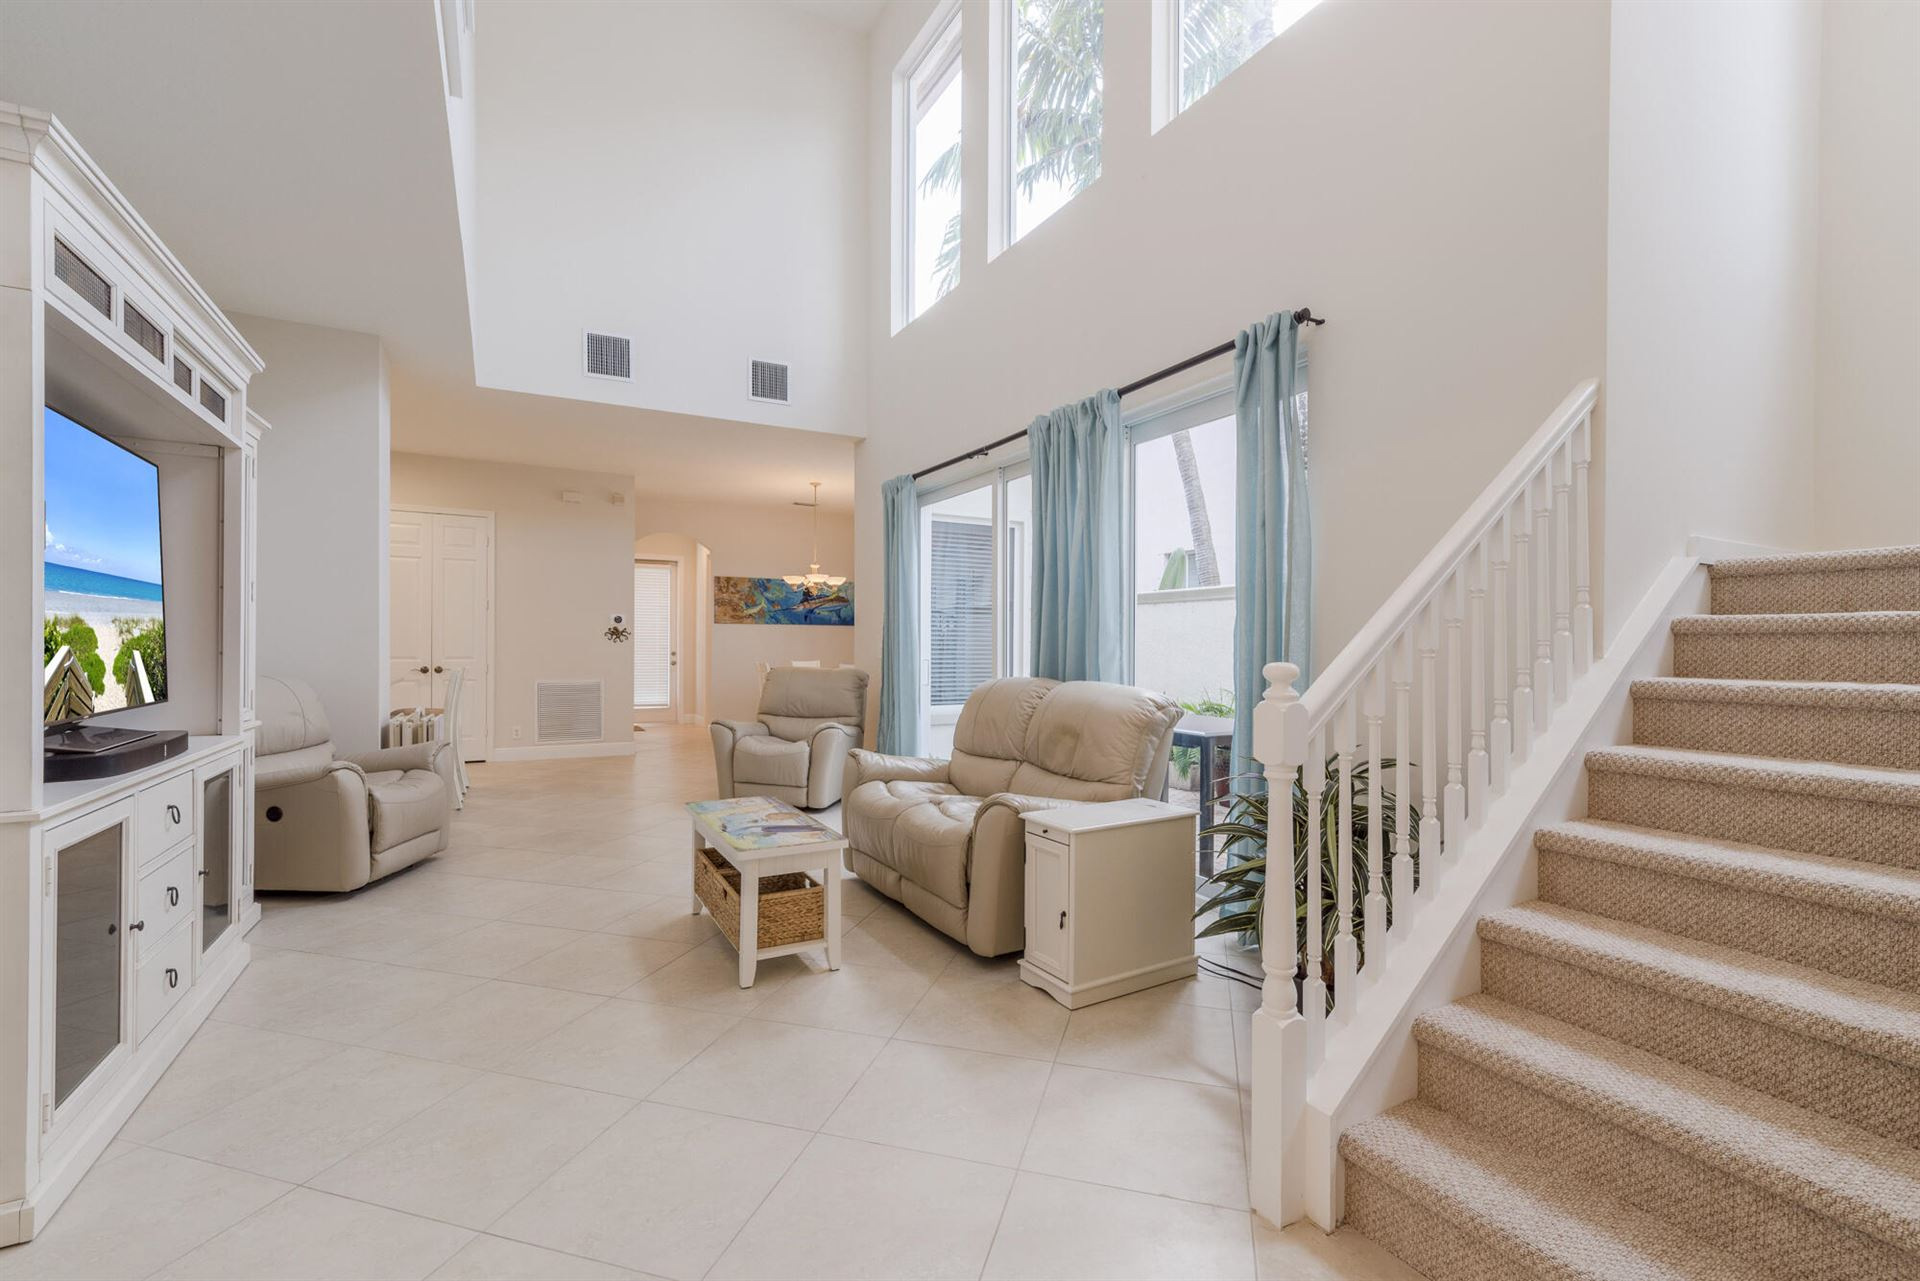 Photo of 60 Stoney Drive, Palm Beach Gardens, FL 33410 (MLS # RX-10746136)